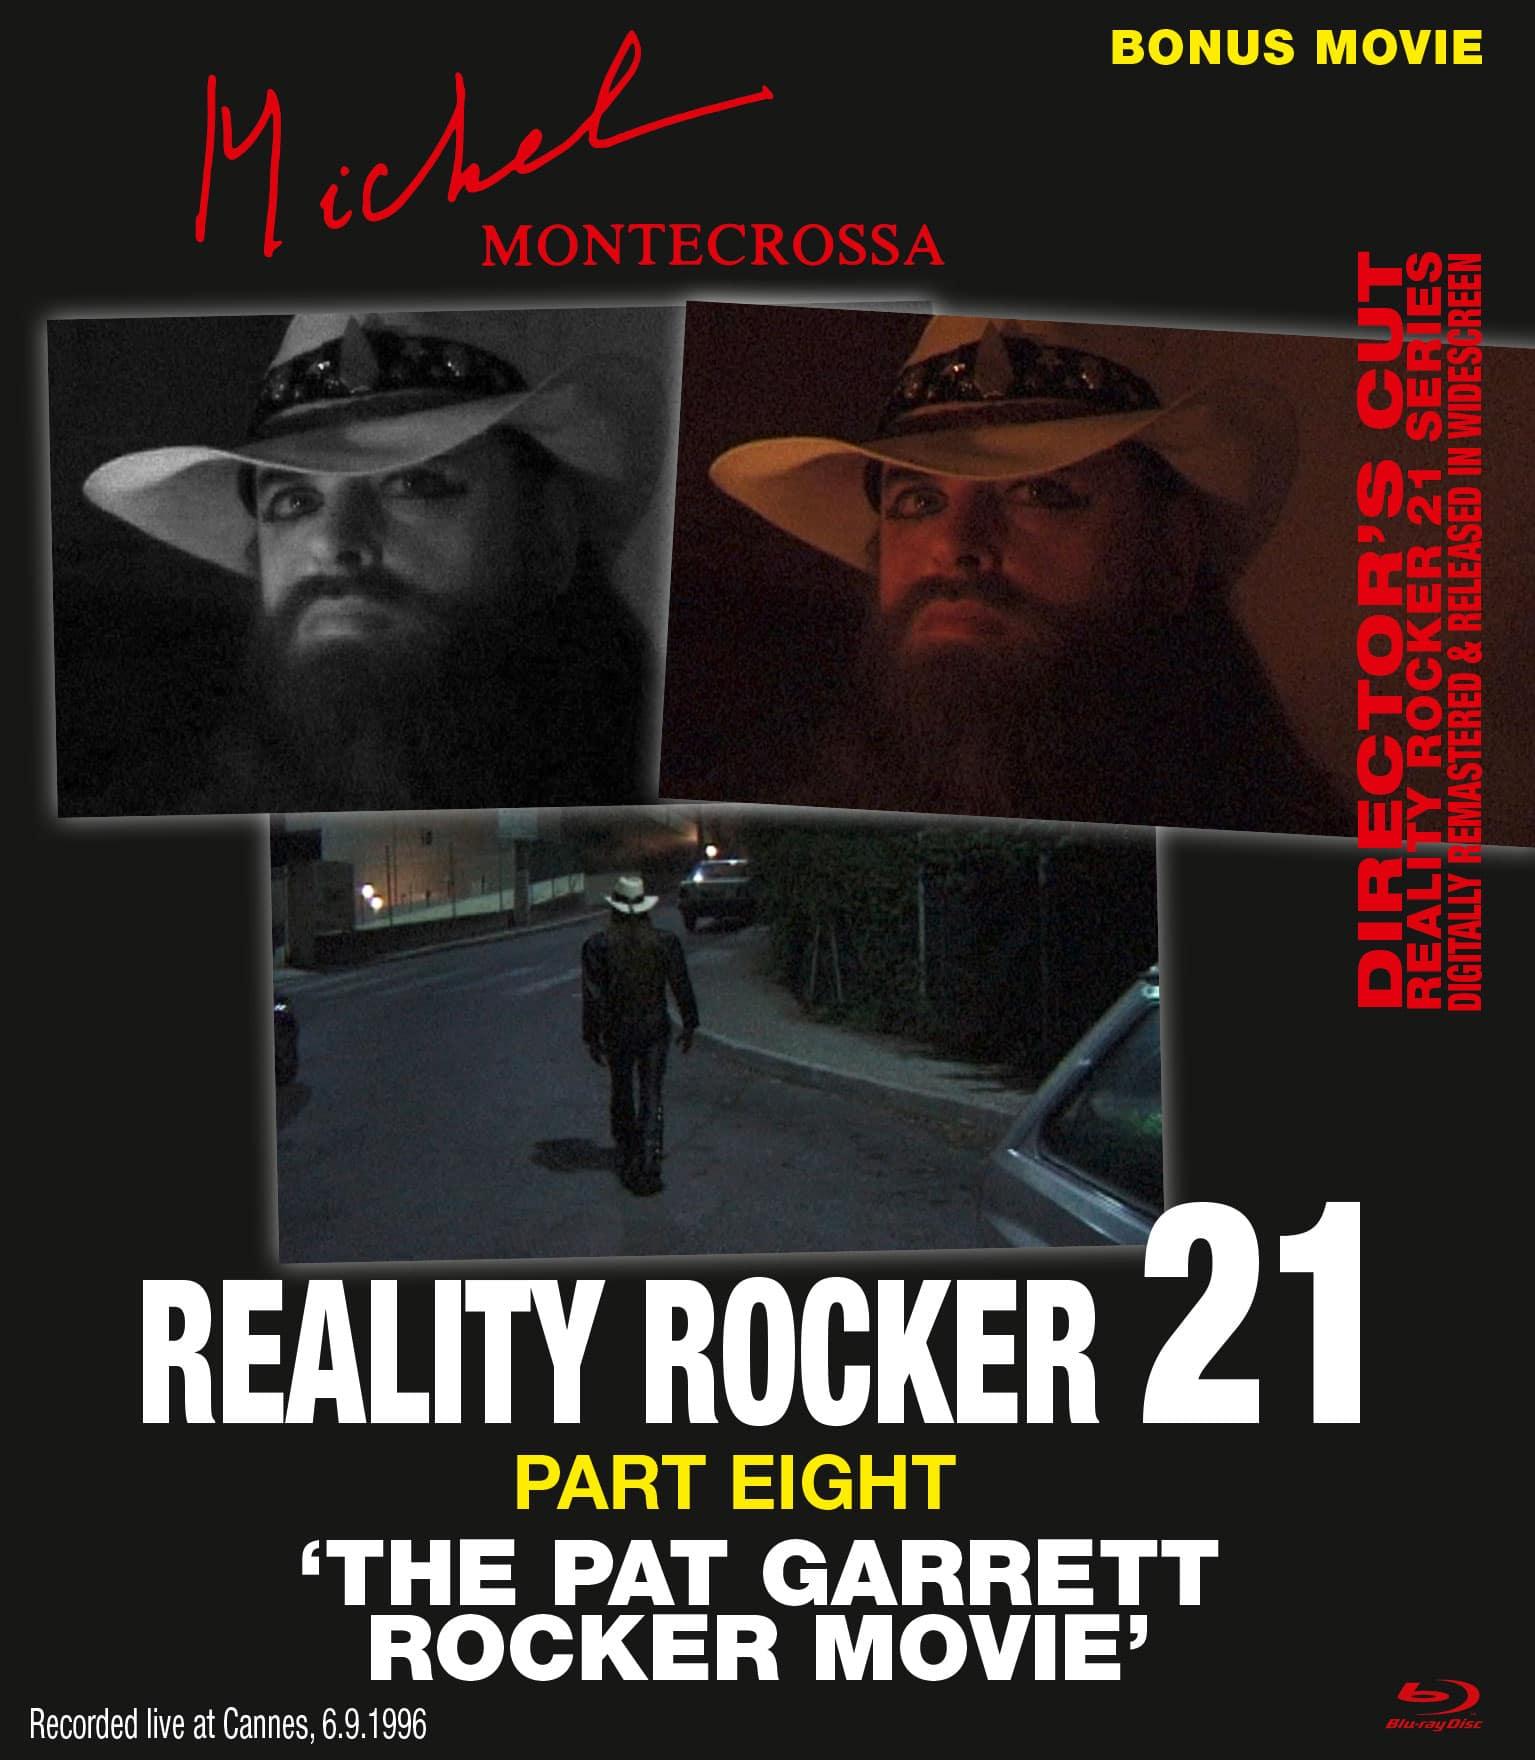 Reality Rocker 21, Part Eight: The Pat Garrett Rocker Movie